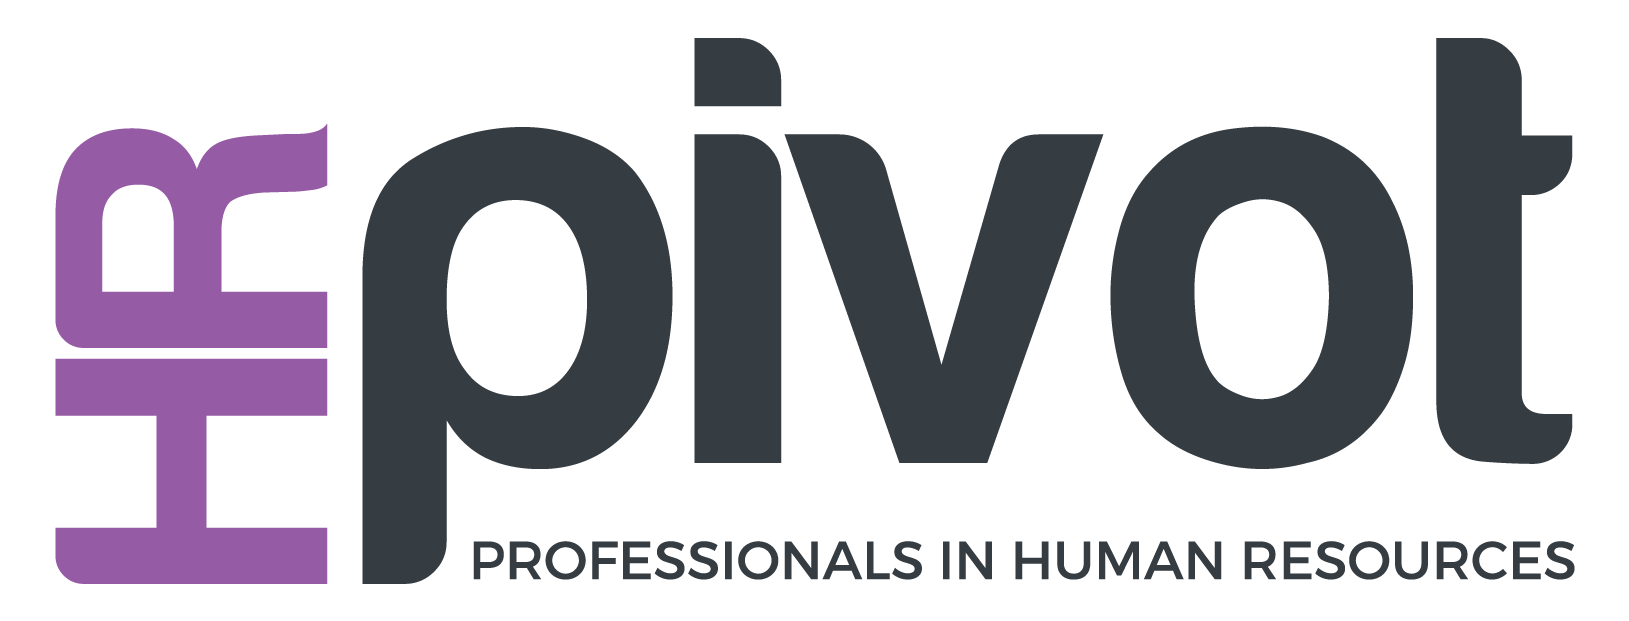 HR Account Manager job in Phoenix - HRPivot